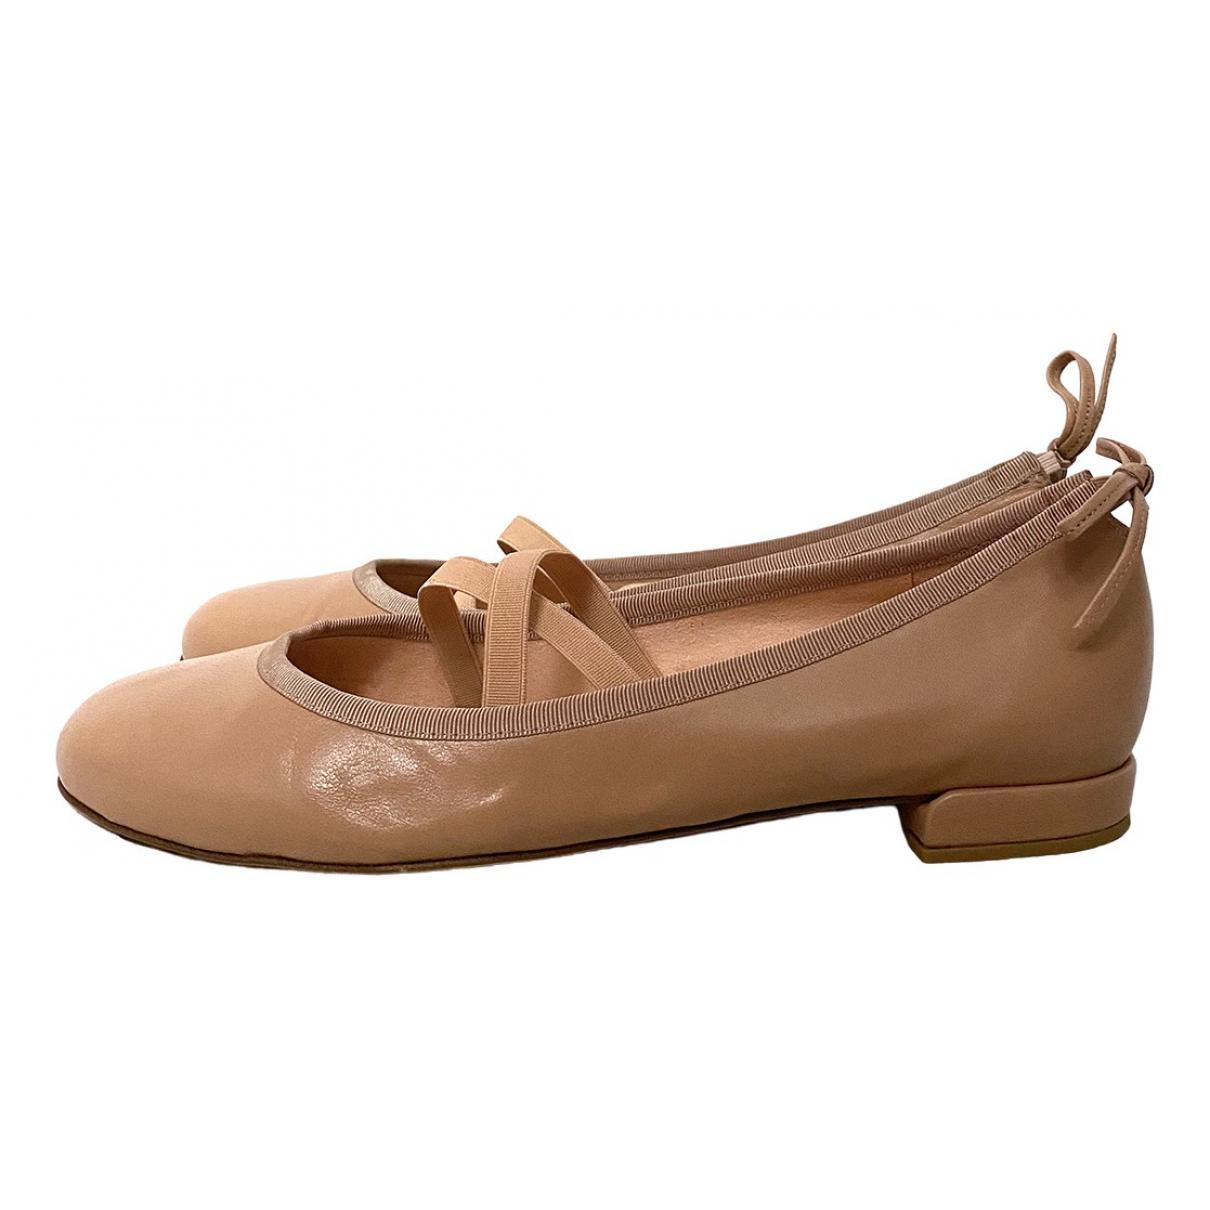 Bailarinas de Cuero Stuart Weitzman